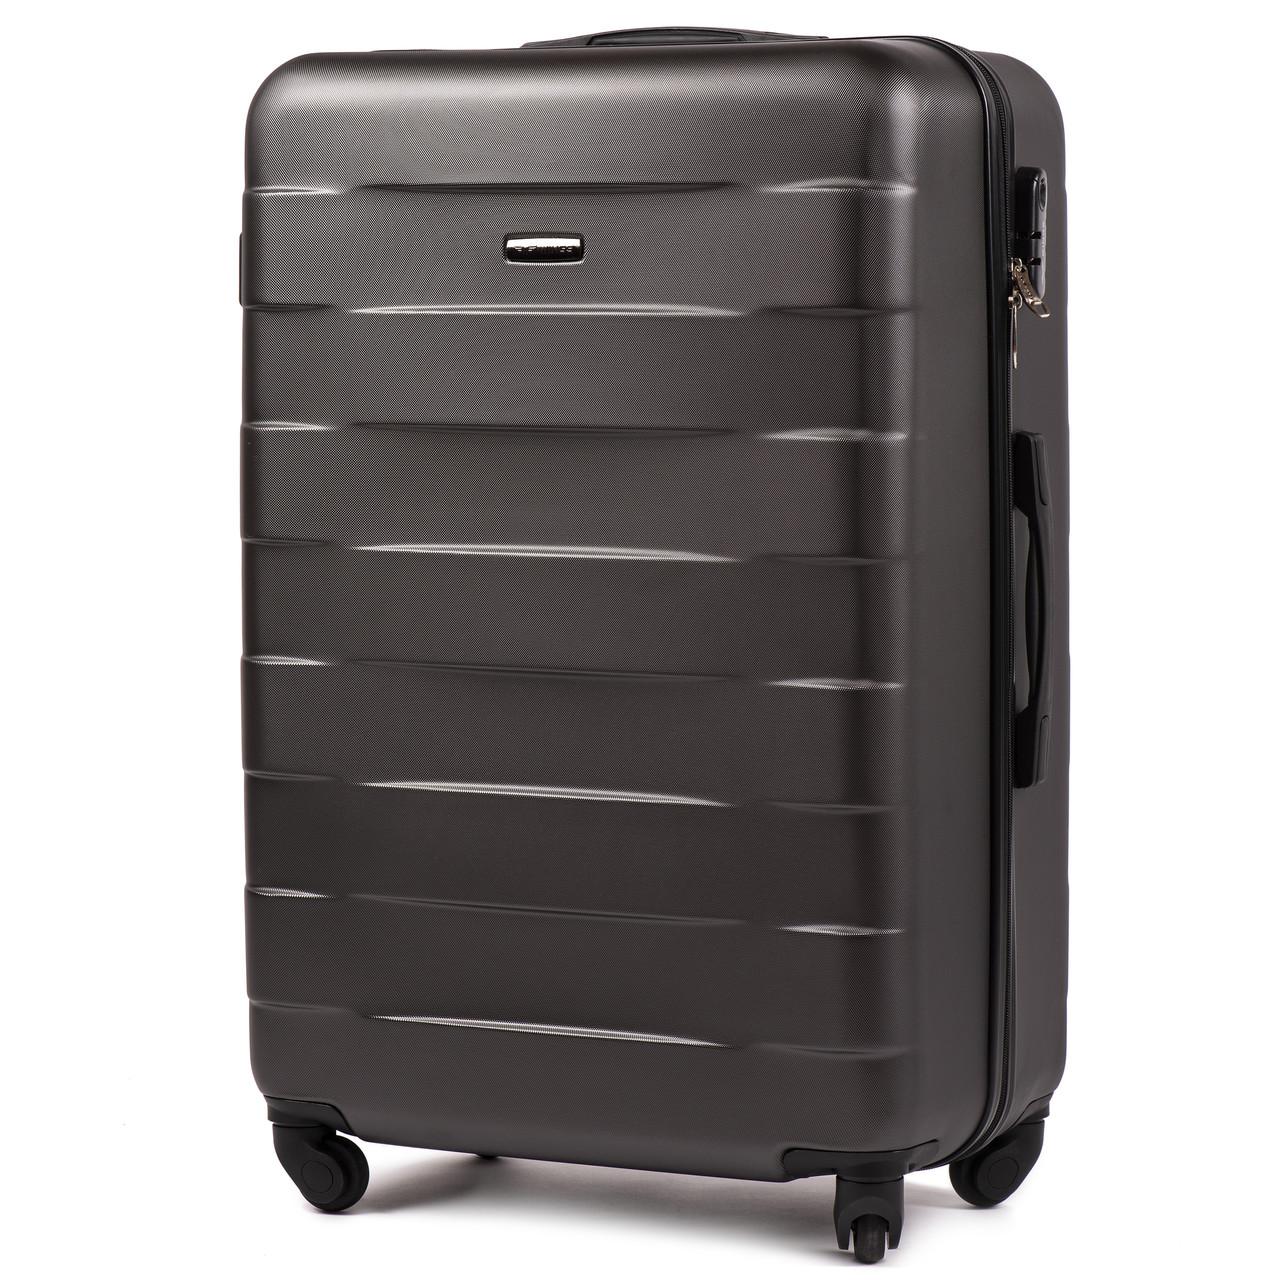 Средний пластиковый чемодан Wings 401 на 4 колесах серый